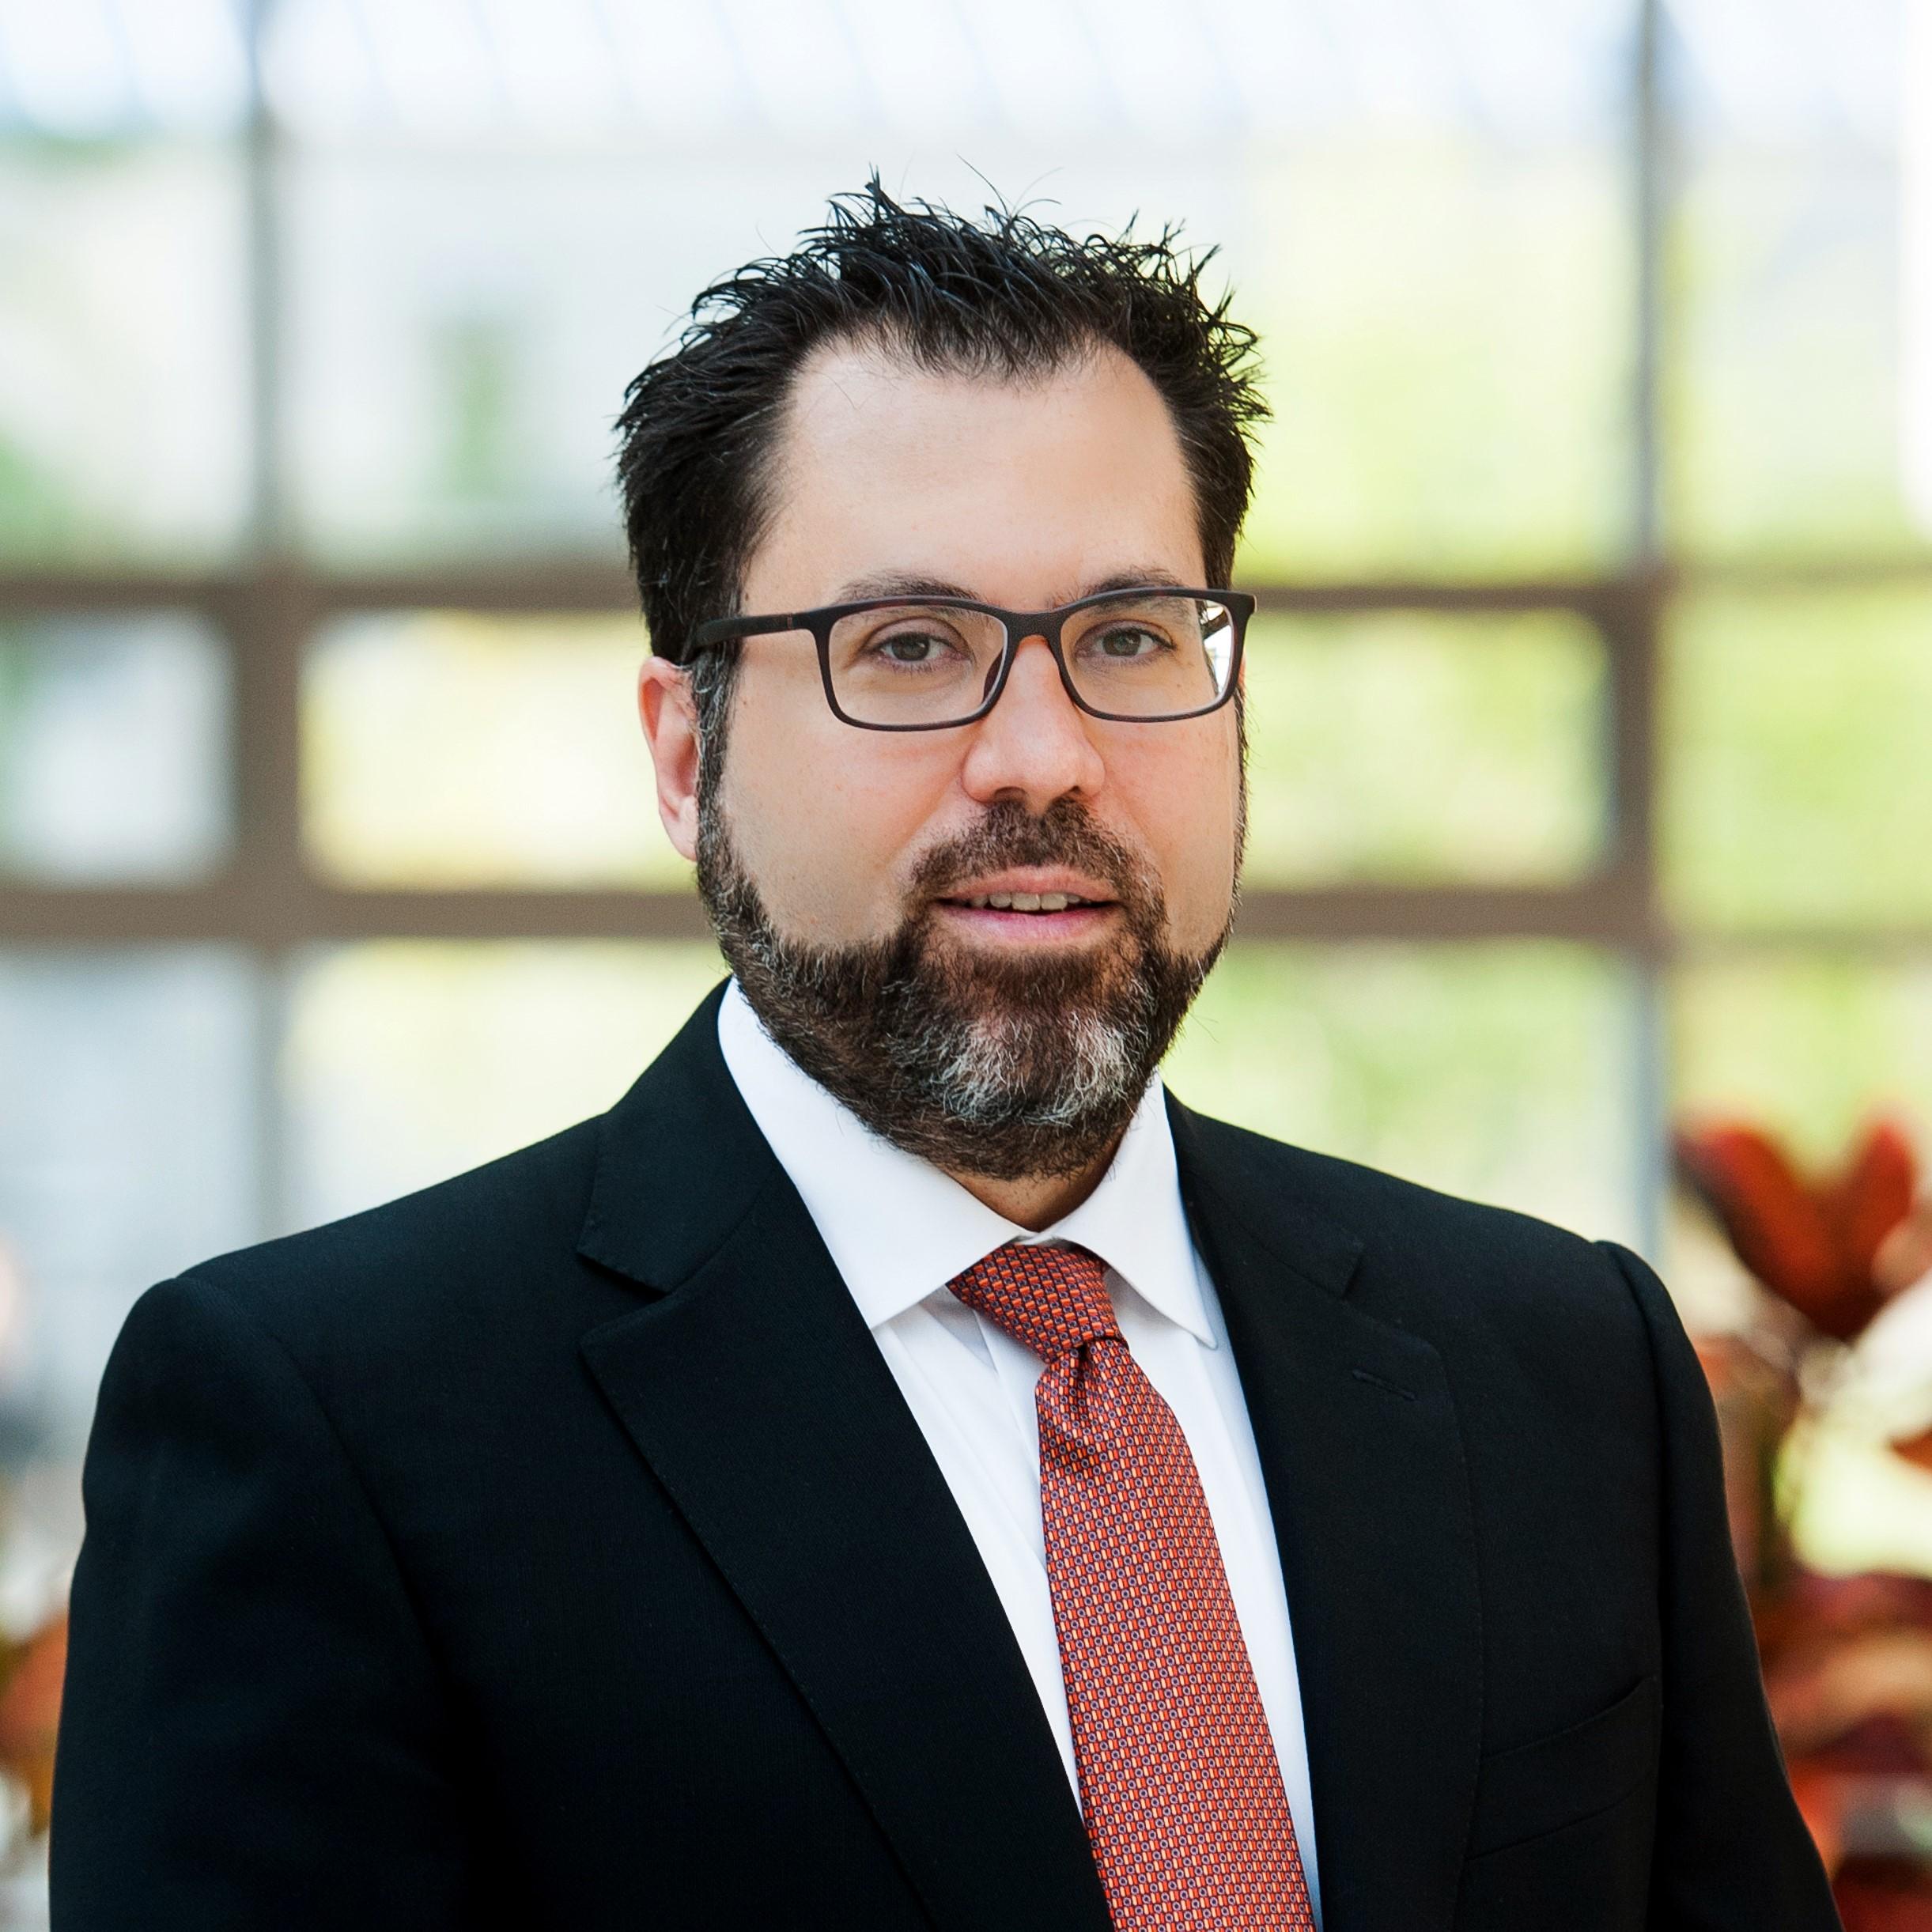 Daniel Adelman, PhD, MSc